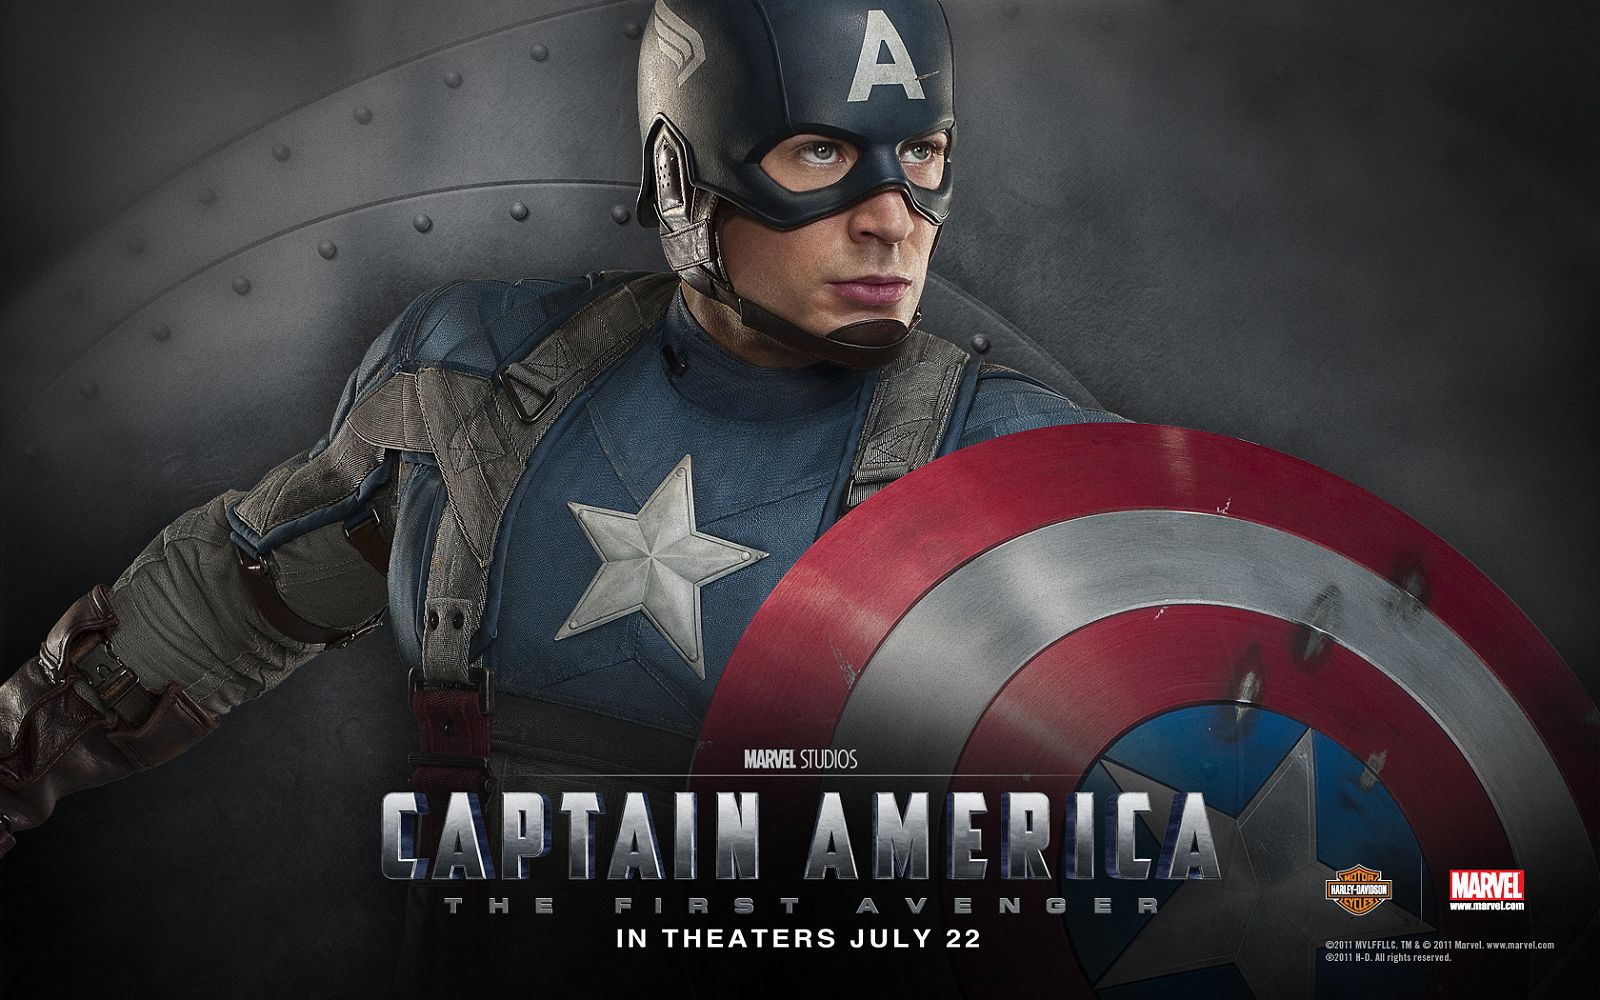 http://1.bp.blogspot.com/-z_NbnvK27qE/UBMLPCTXxBI/AAAAAAAAMqM/jL6fgOqWLmg/s1600/Captain-America-Wallpaper-moto-1.jpg